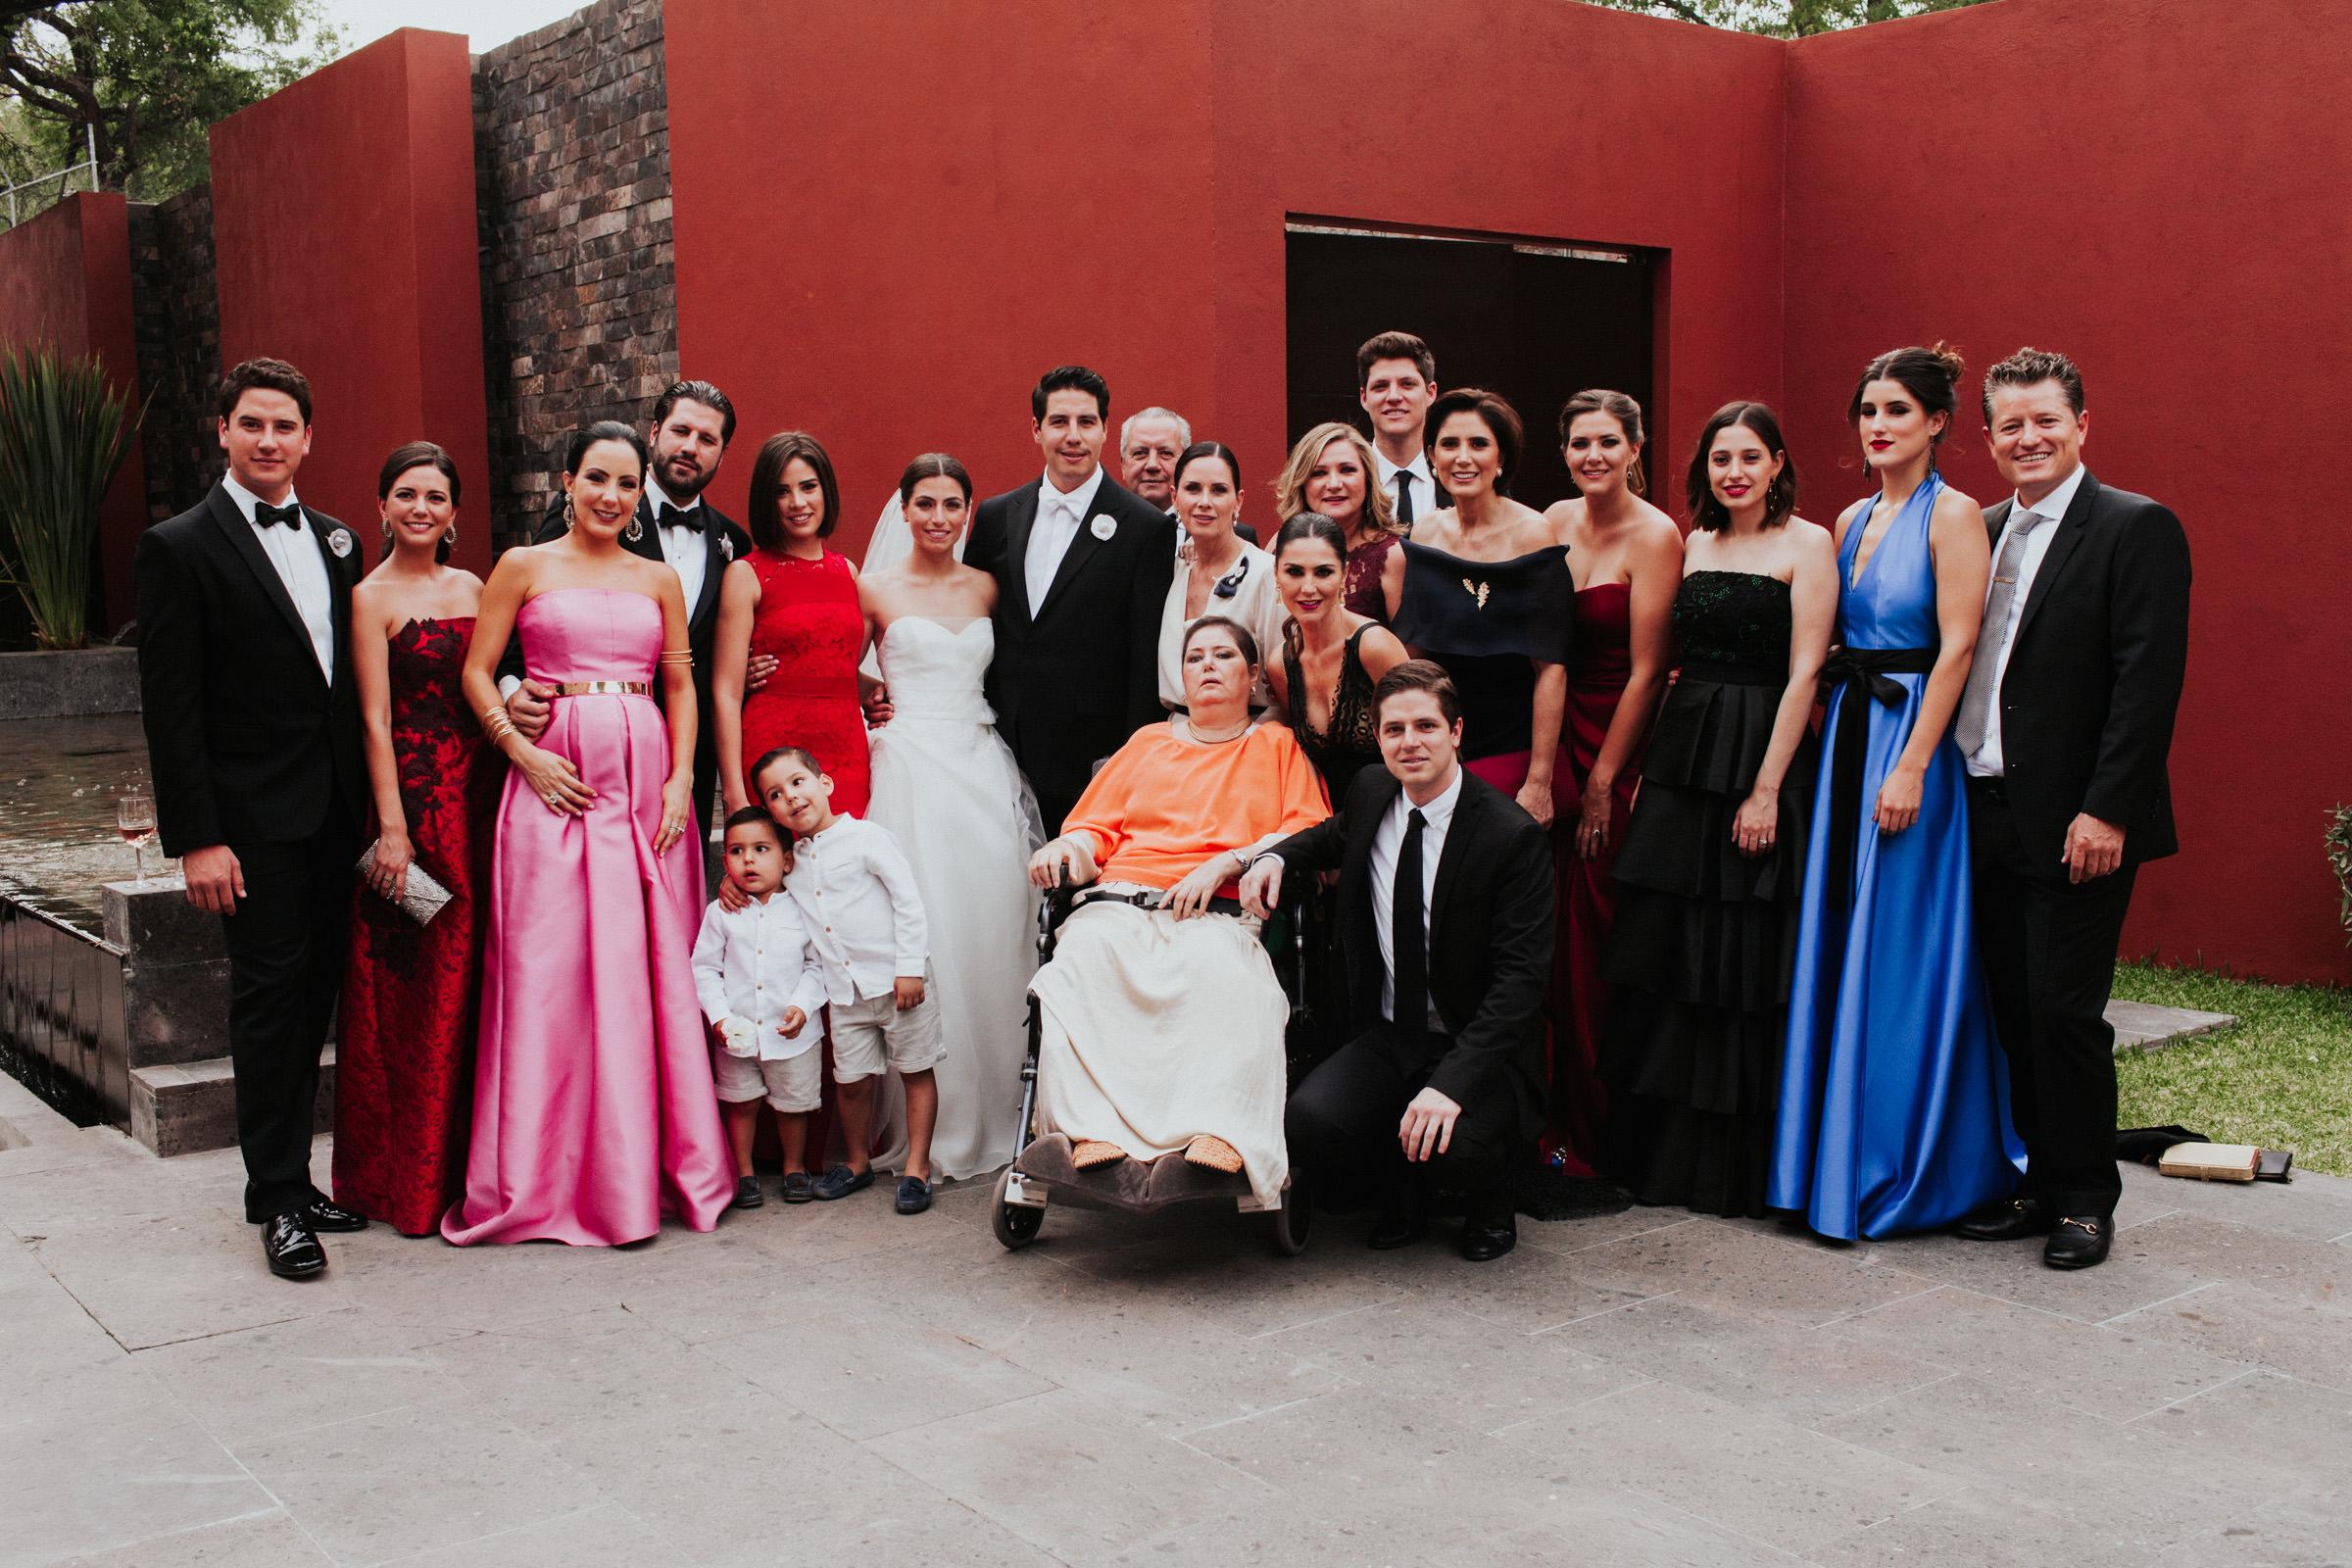 Boda-Leon-Guanajuato-Casa-de-Piedra-Isabella-Daniel-Pierce--108.jpg